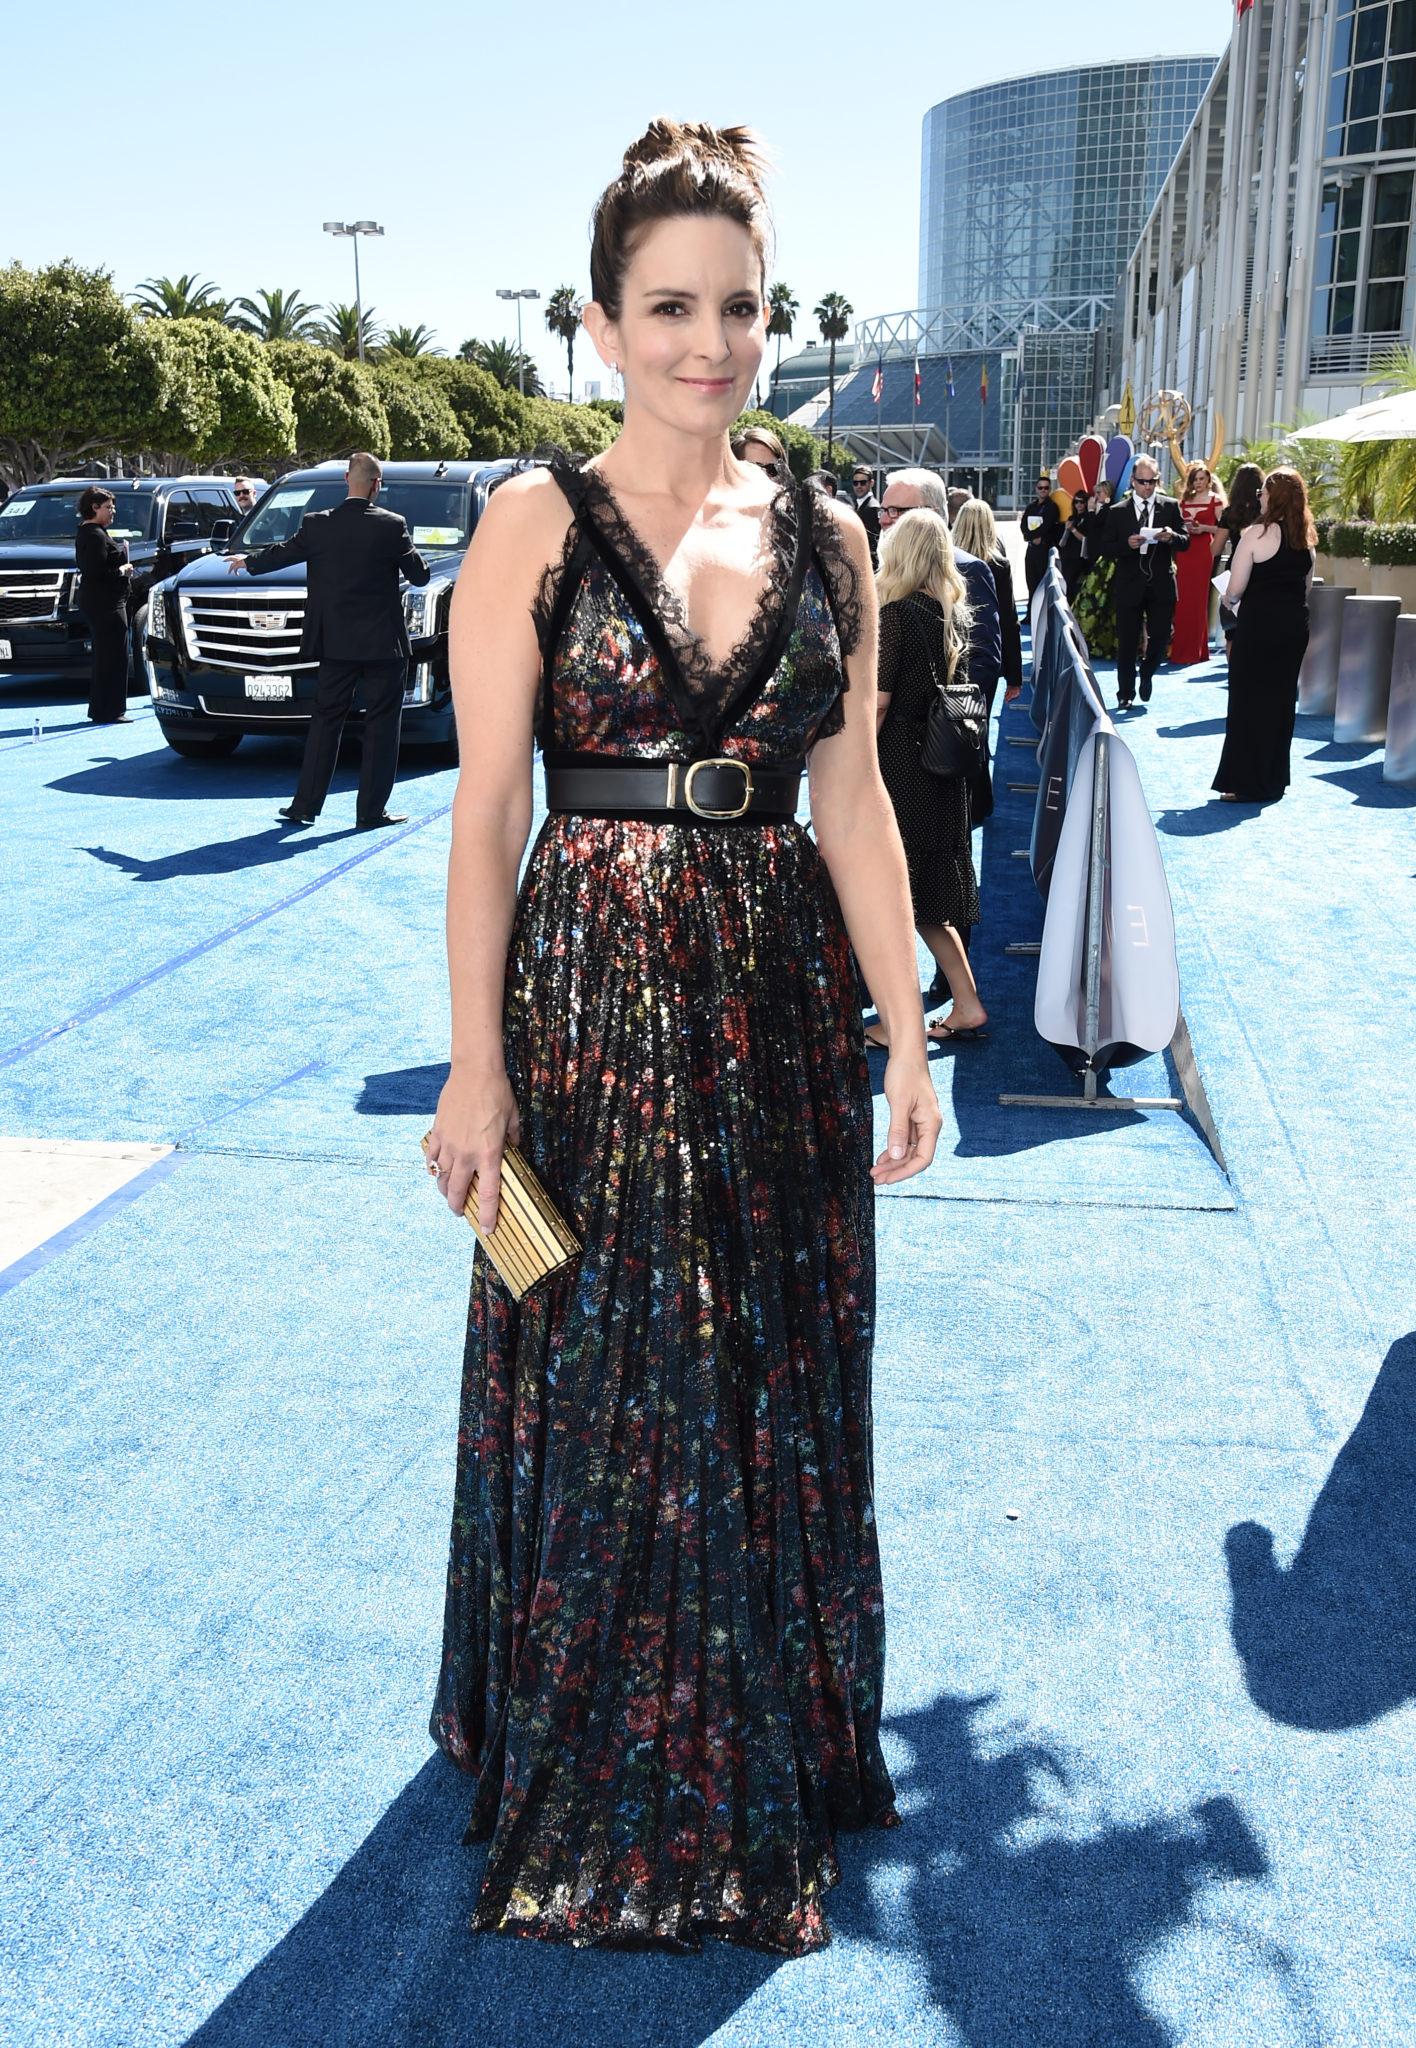 Tina Fey Emmys 4Chion Lifestyle